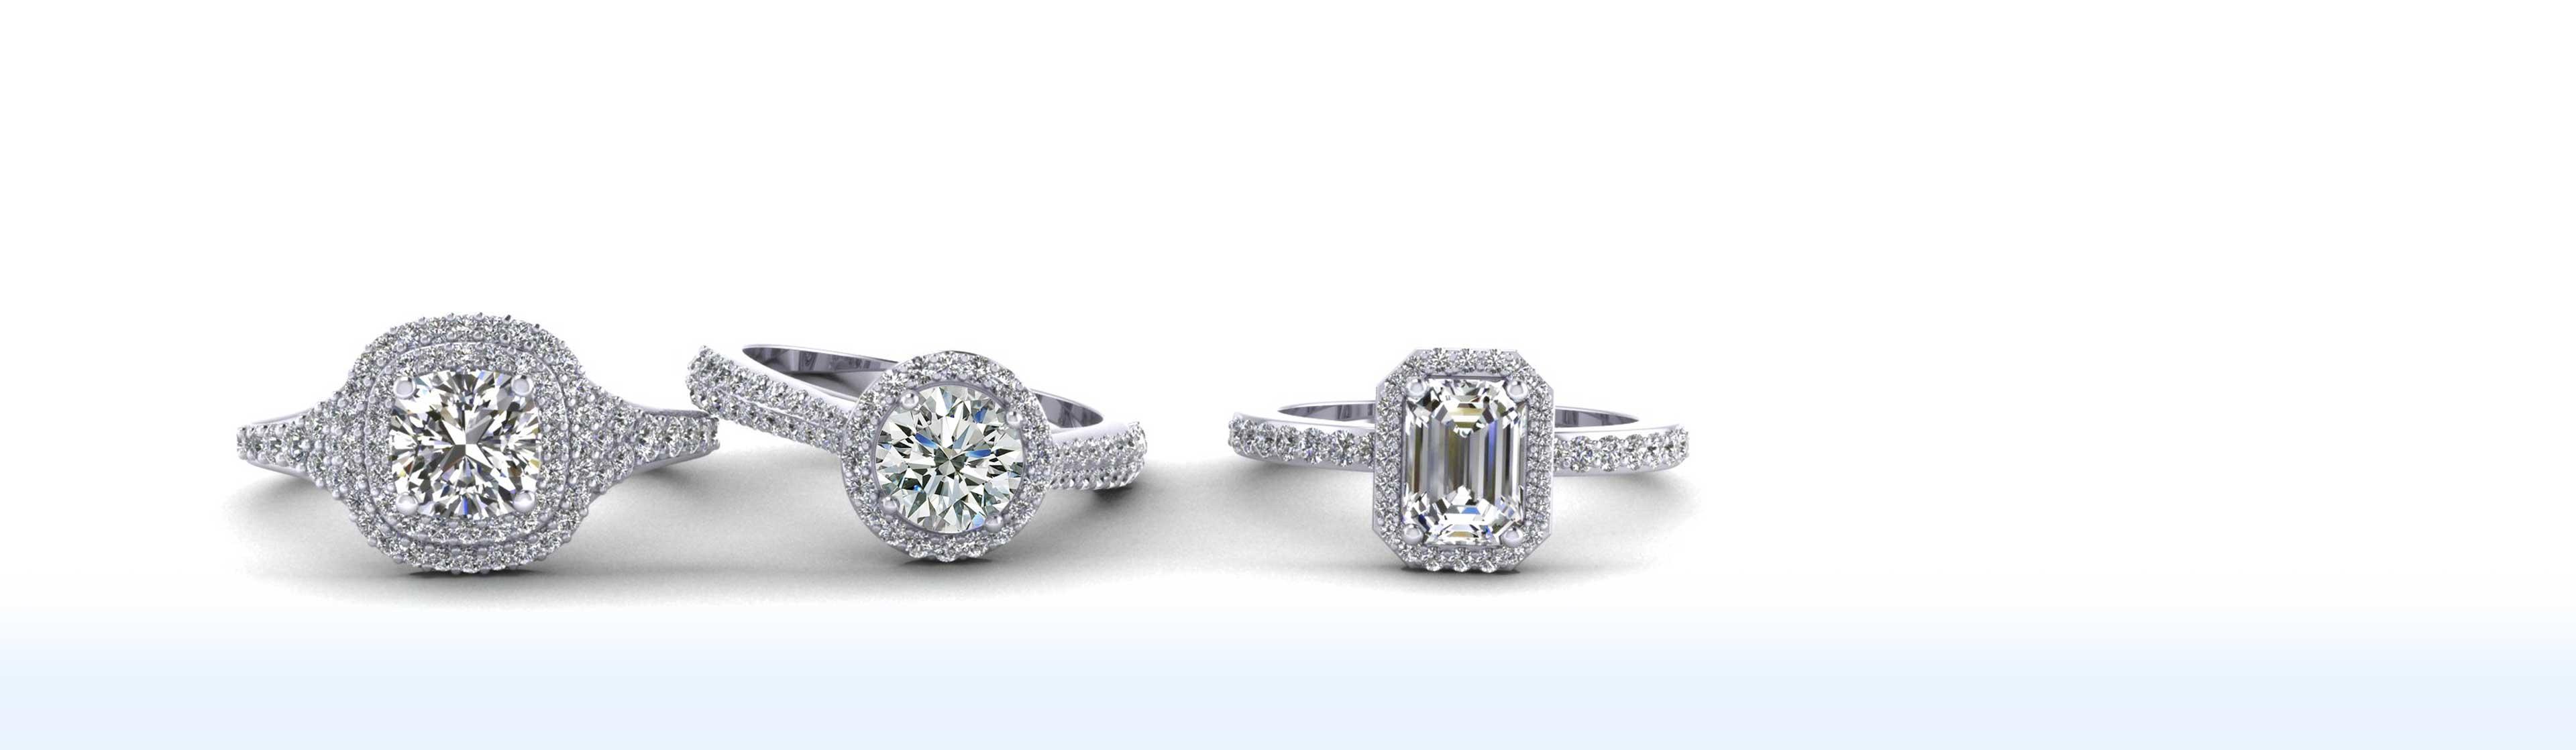 Diamond Engagement & Anniversary Rings Bridal Wedding Sets